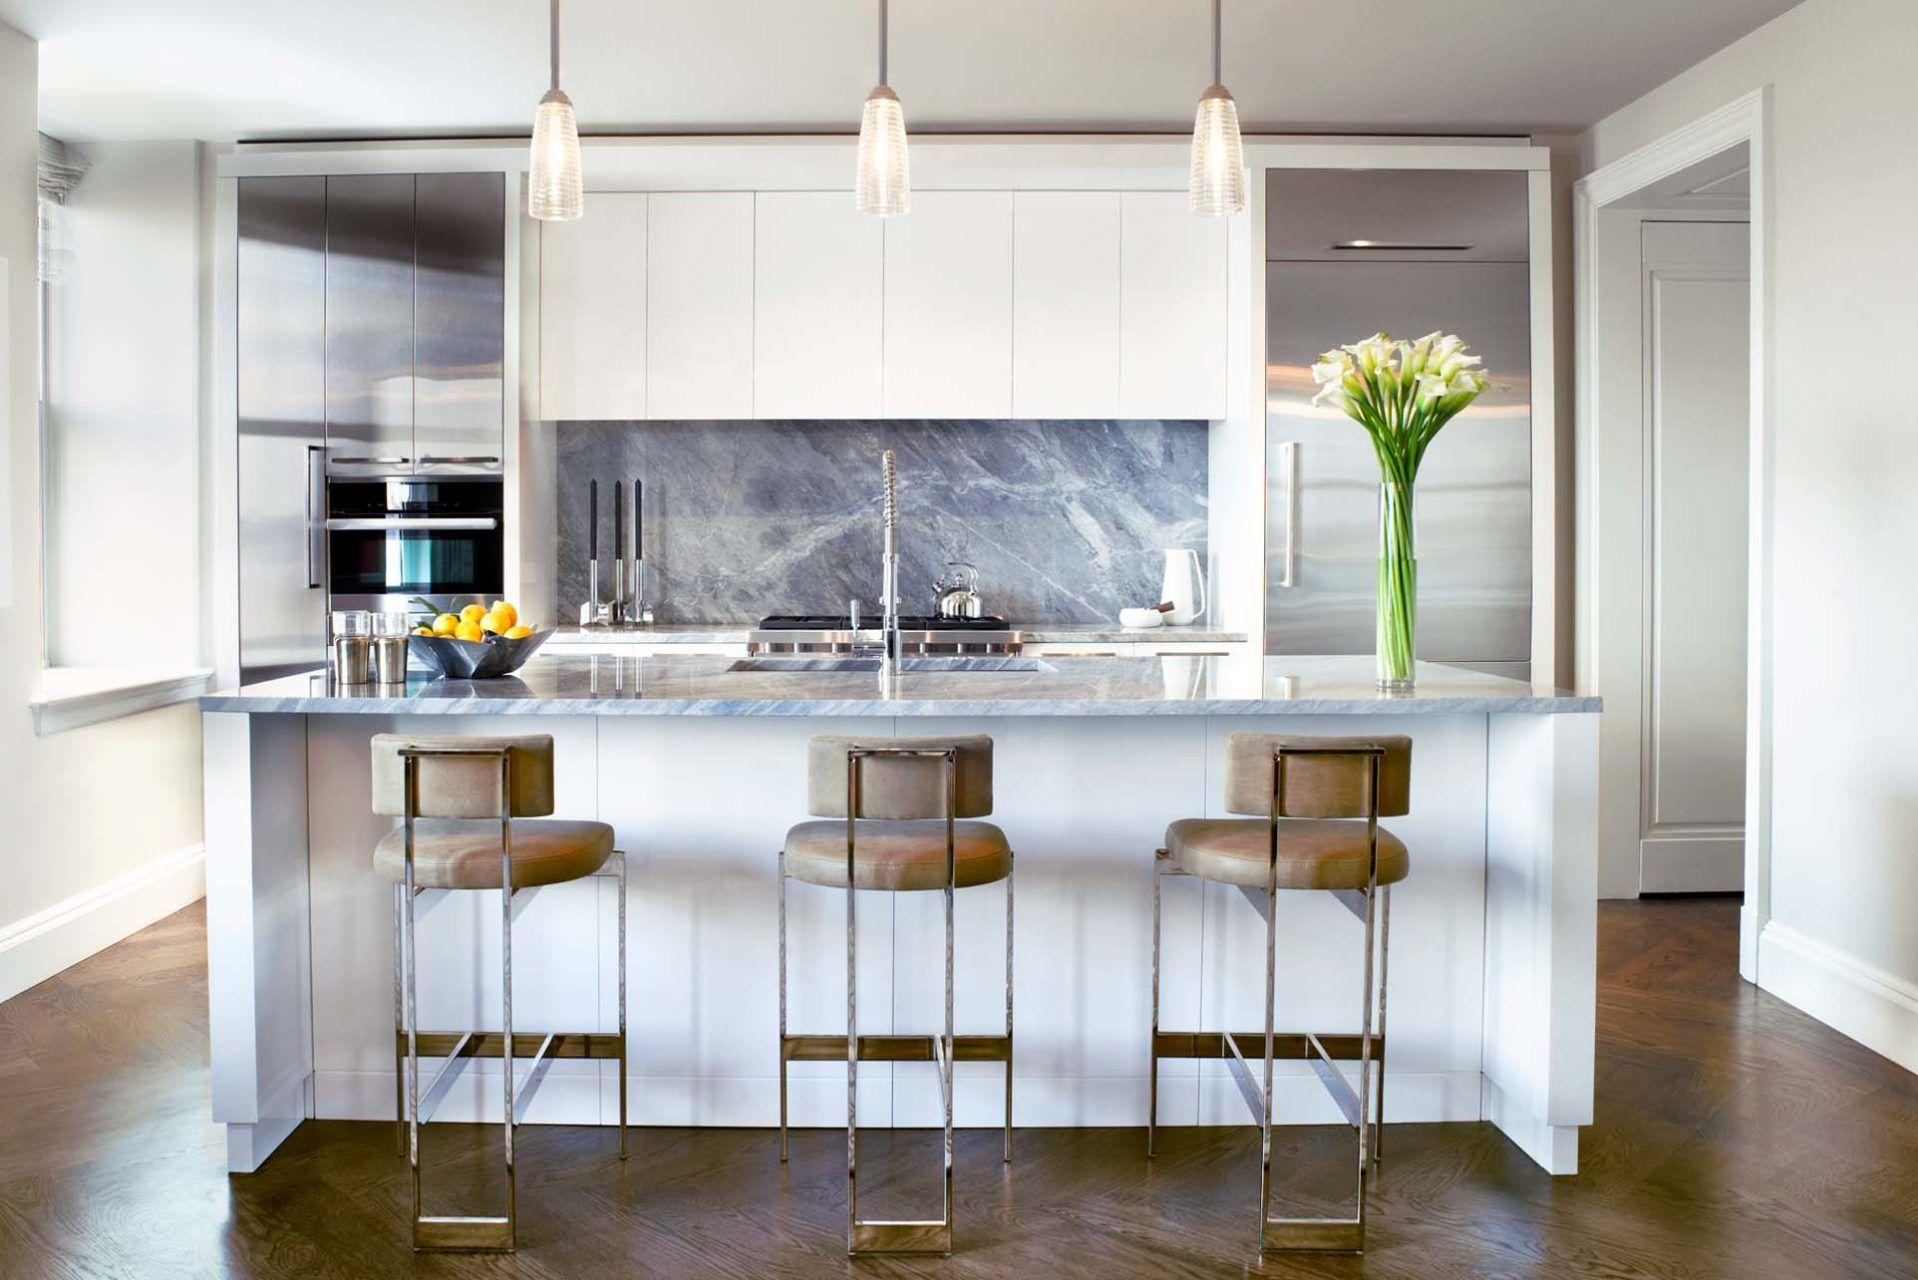 Unit 603 Kitchen Resize Kitchen Remodel Inspiration Kitchen Design Kitchen Marble